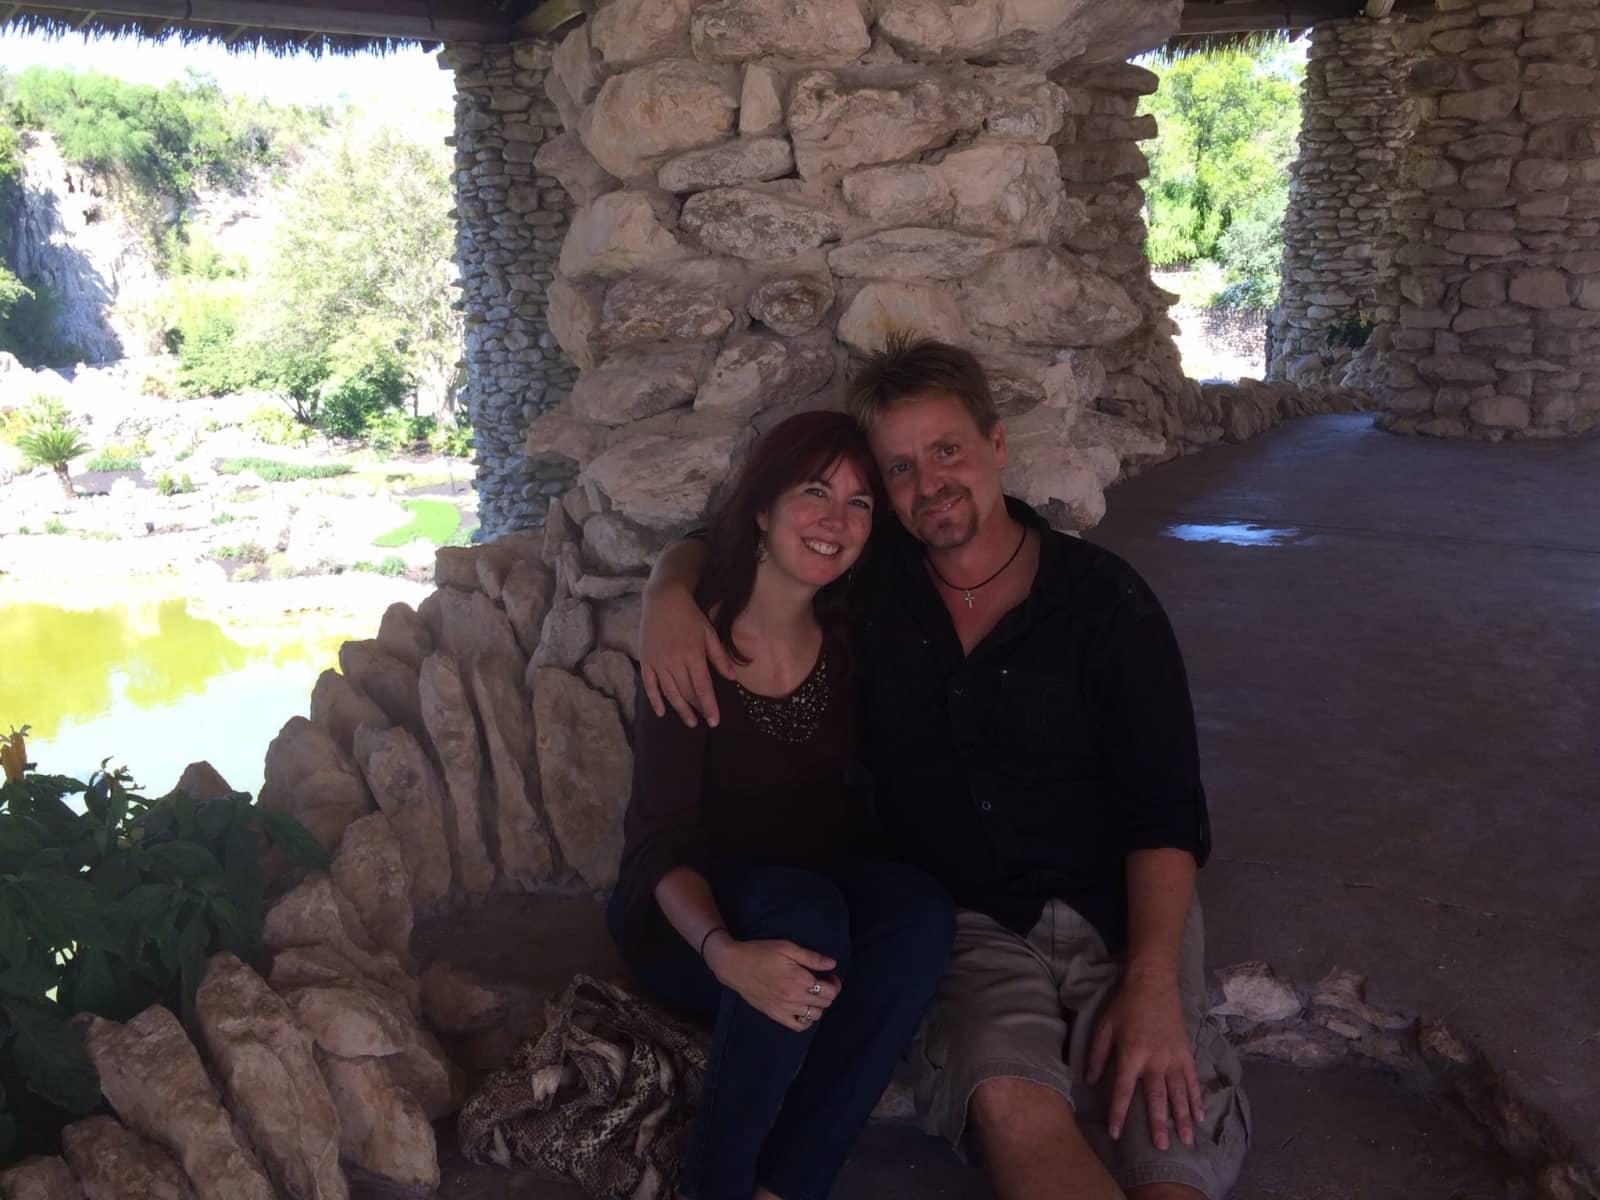 Lisa and matt & Matt from Essex Junction, Vermont, United States